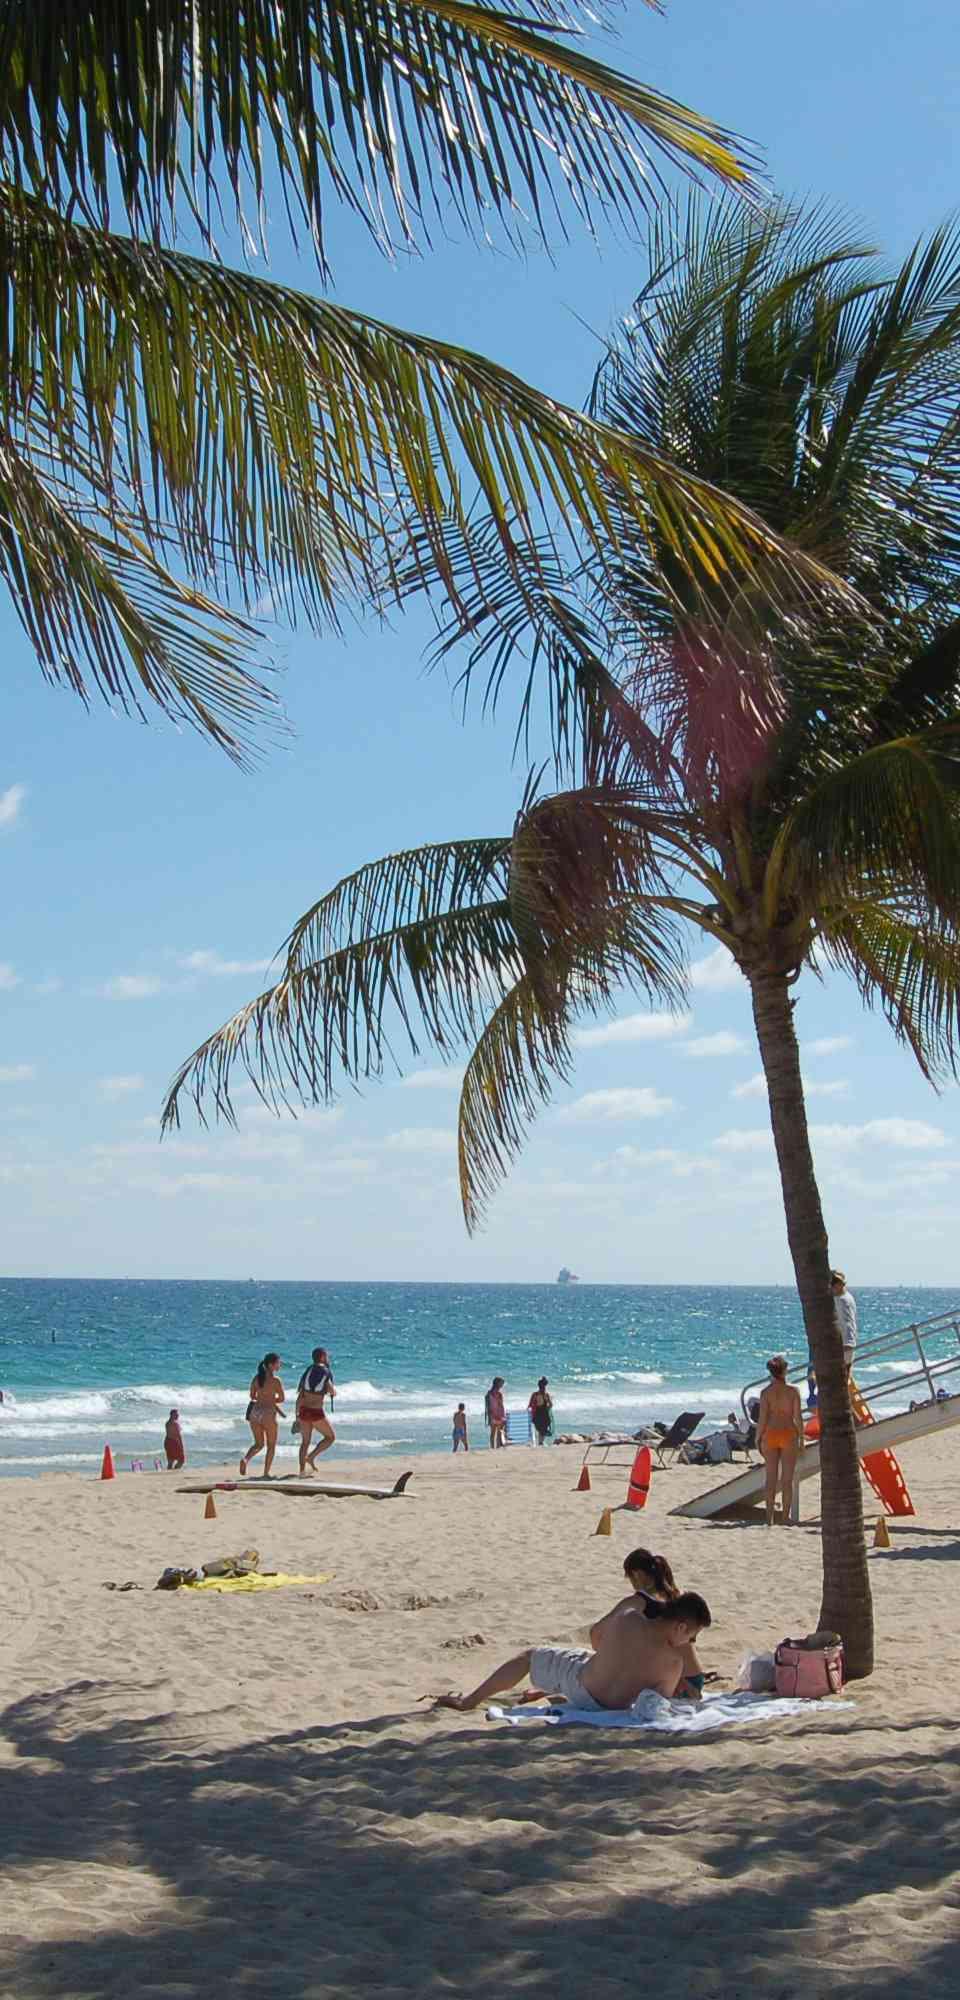 Beach in Fort Lauderdale, Florida